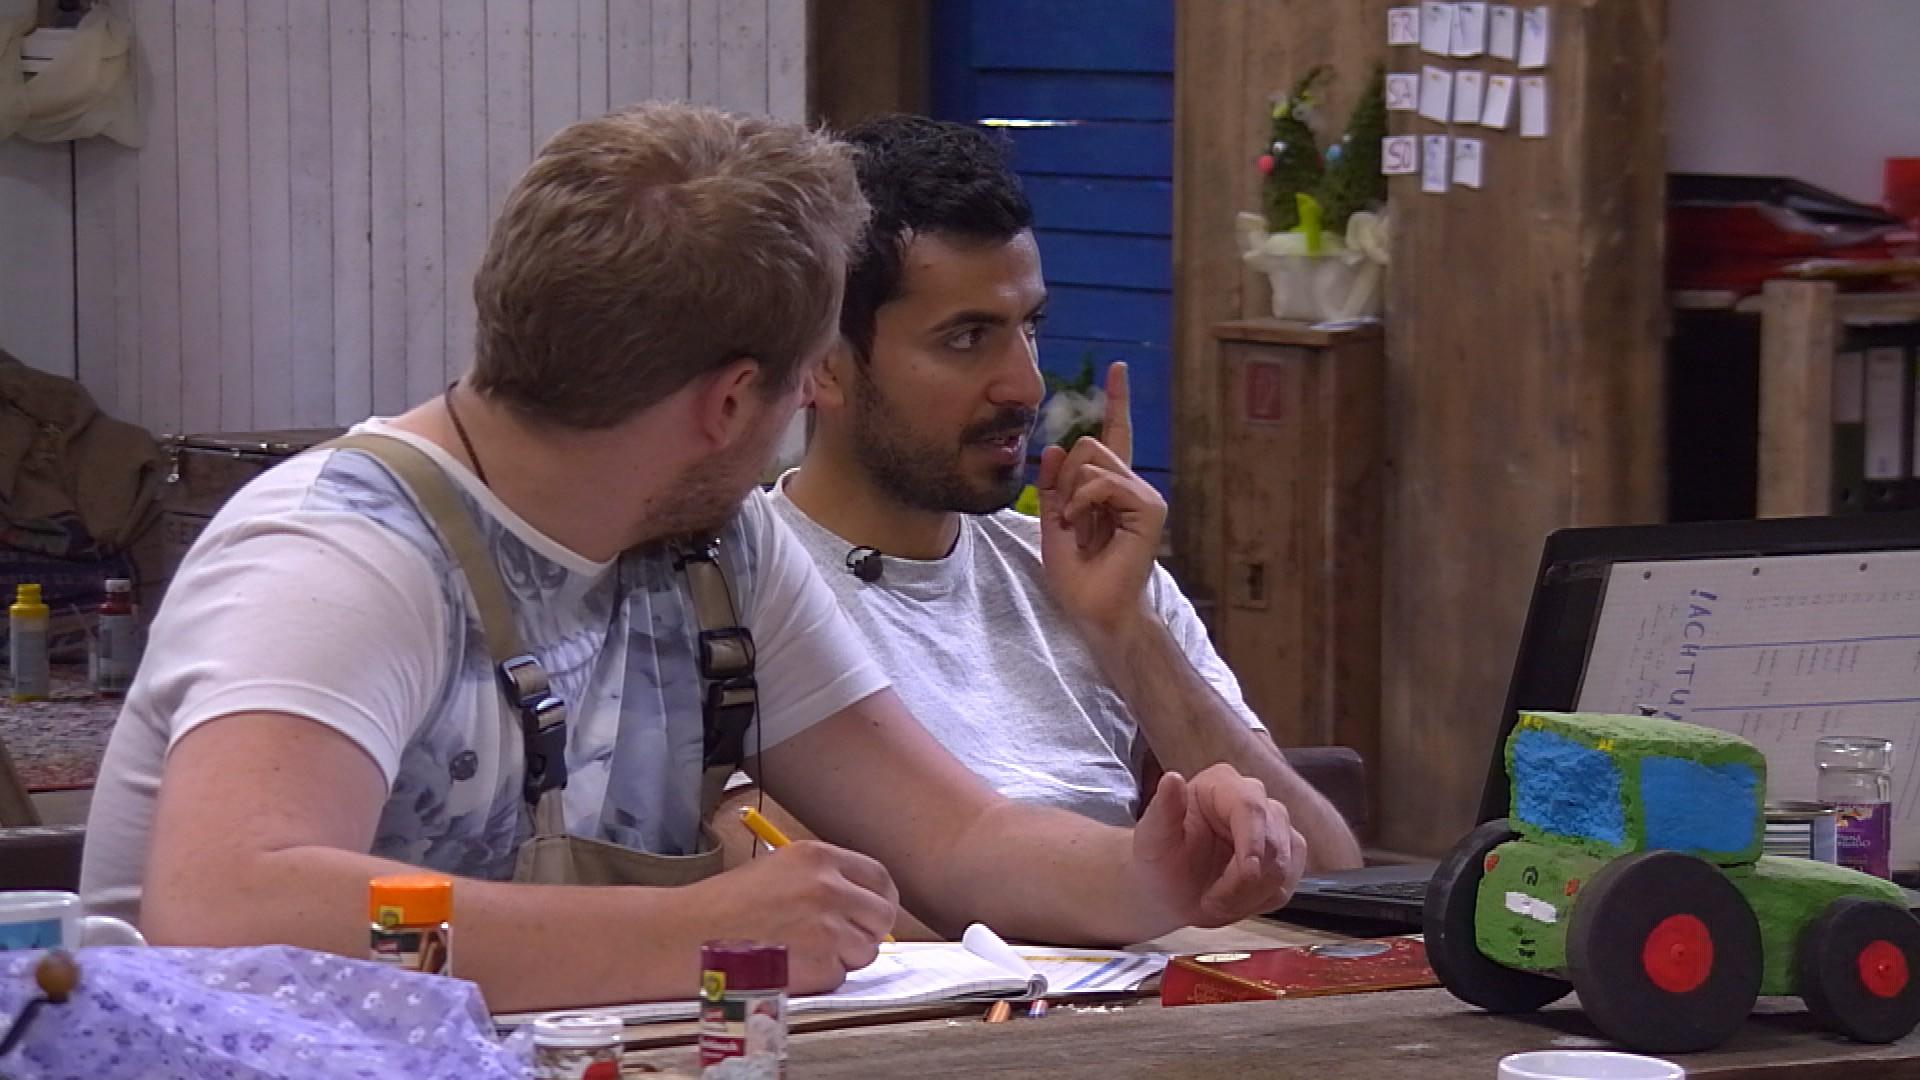 Newtopia Hotel Planungen Peyman Folge 61 Episode 21.05.2015